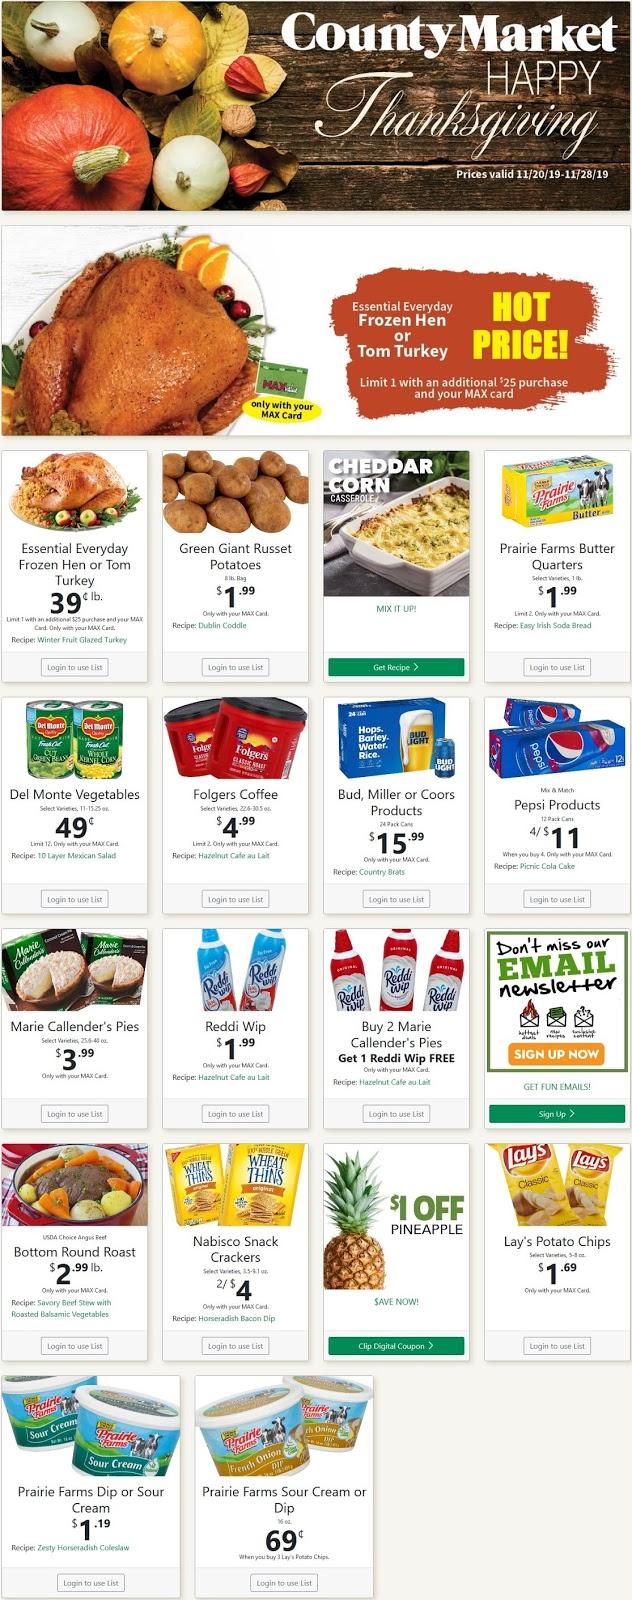 ⭐ County Market Ad 2/26/20 ⭐ County Market Weekly Ad February 26 2020